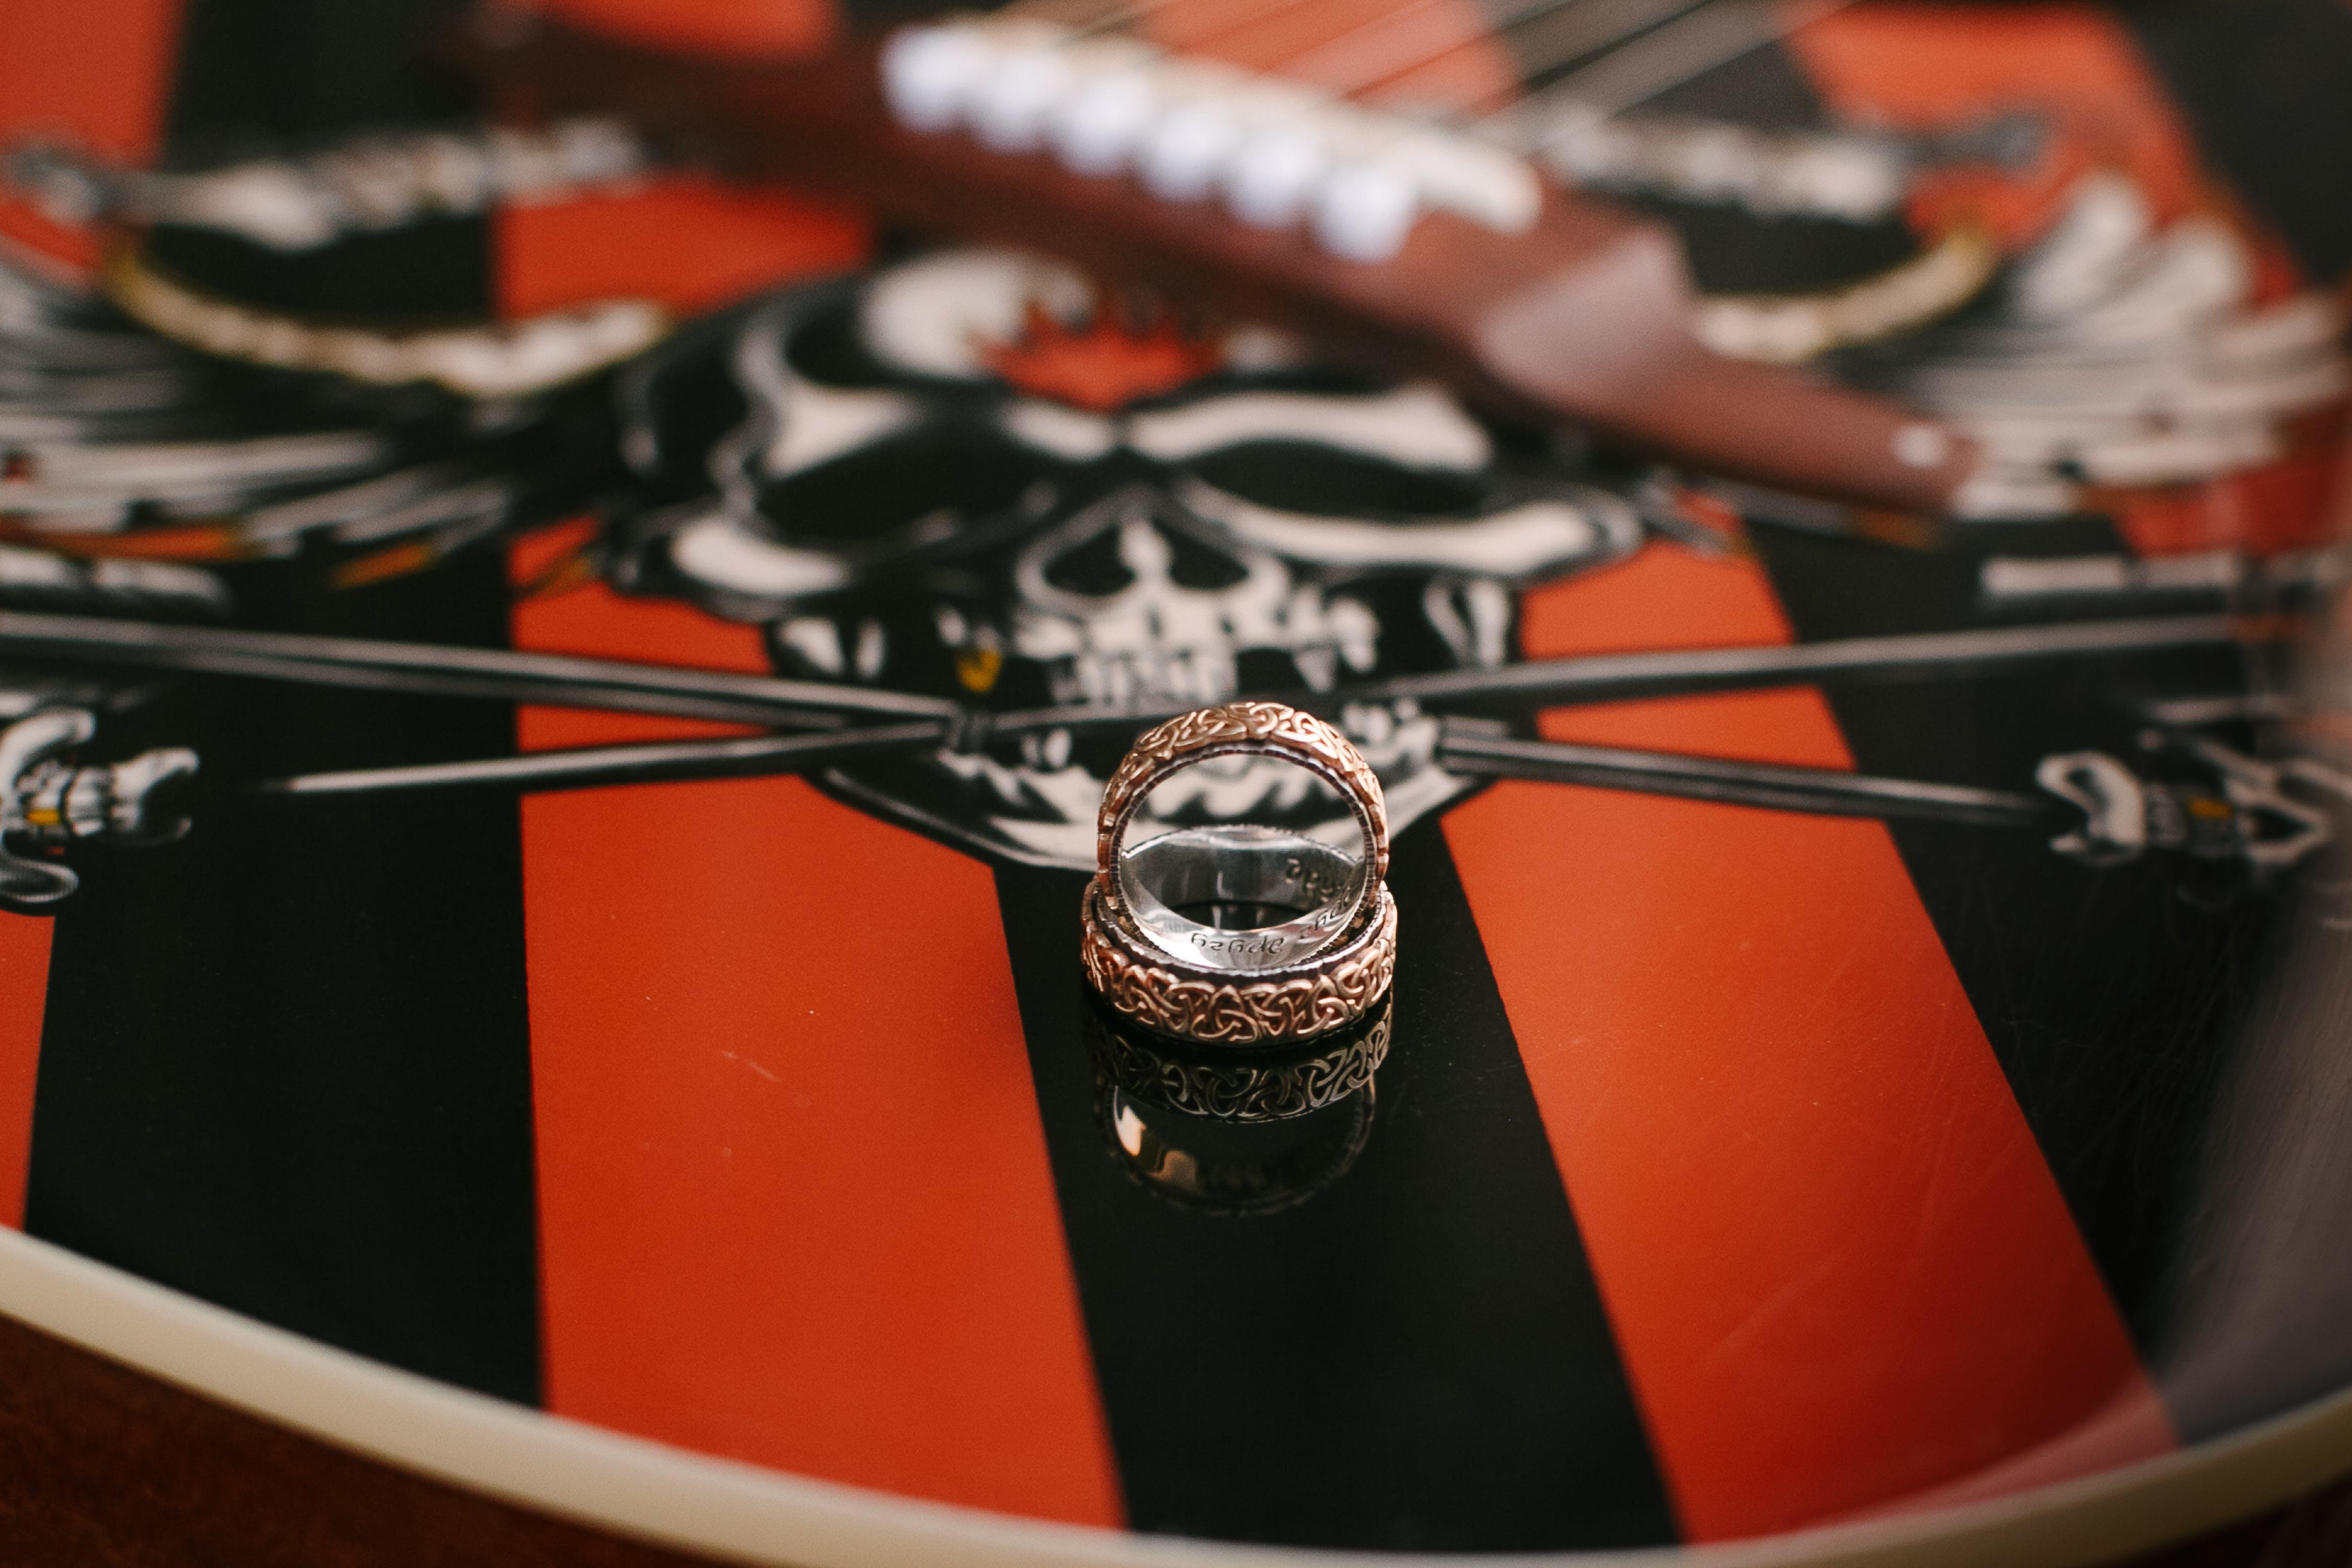 Free stock photo of guitar, wedding, wedding rings